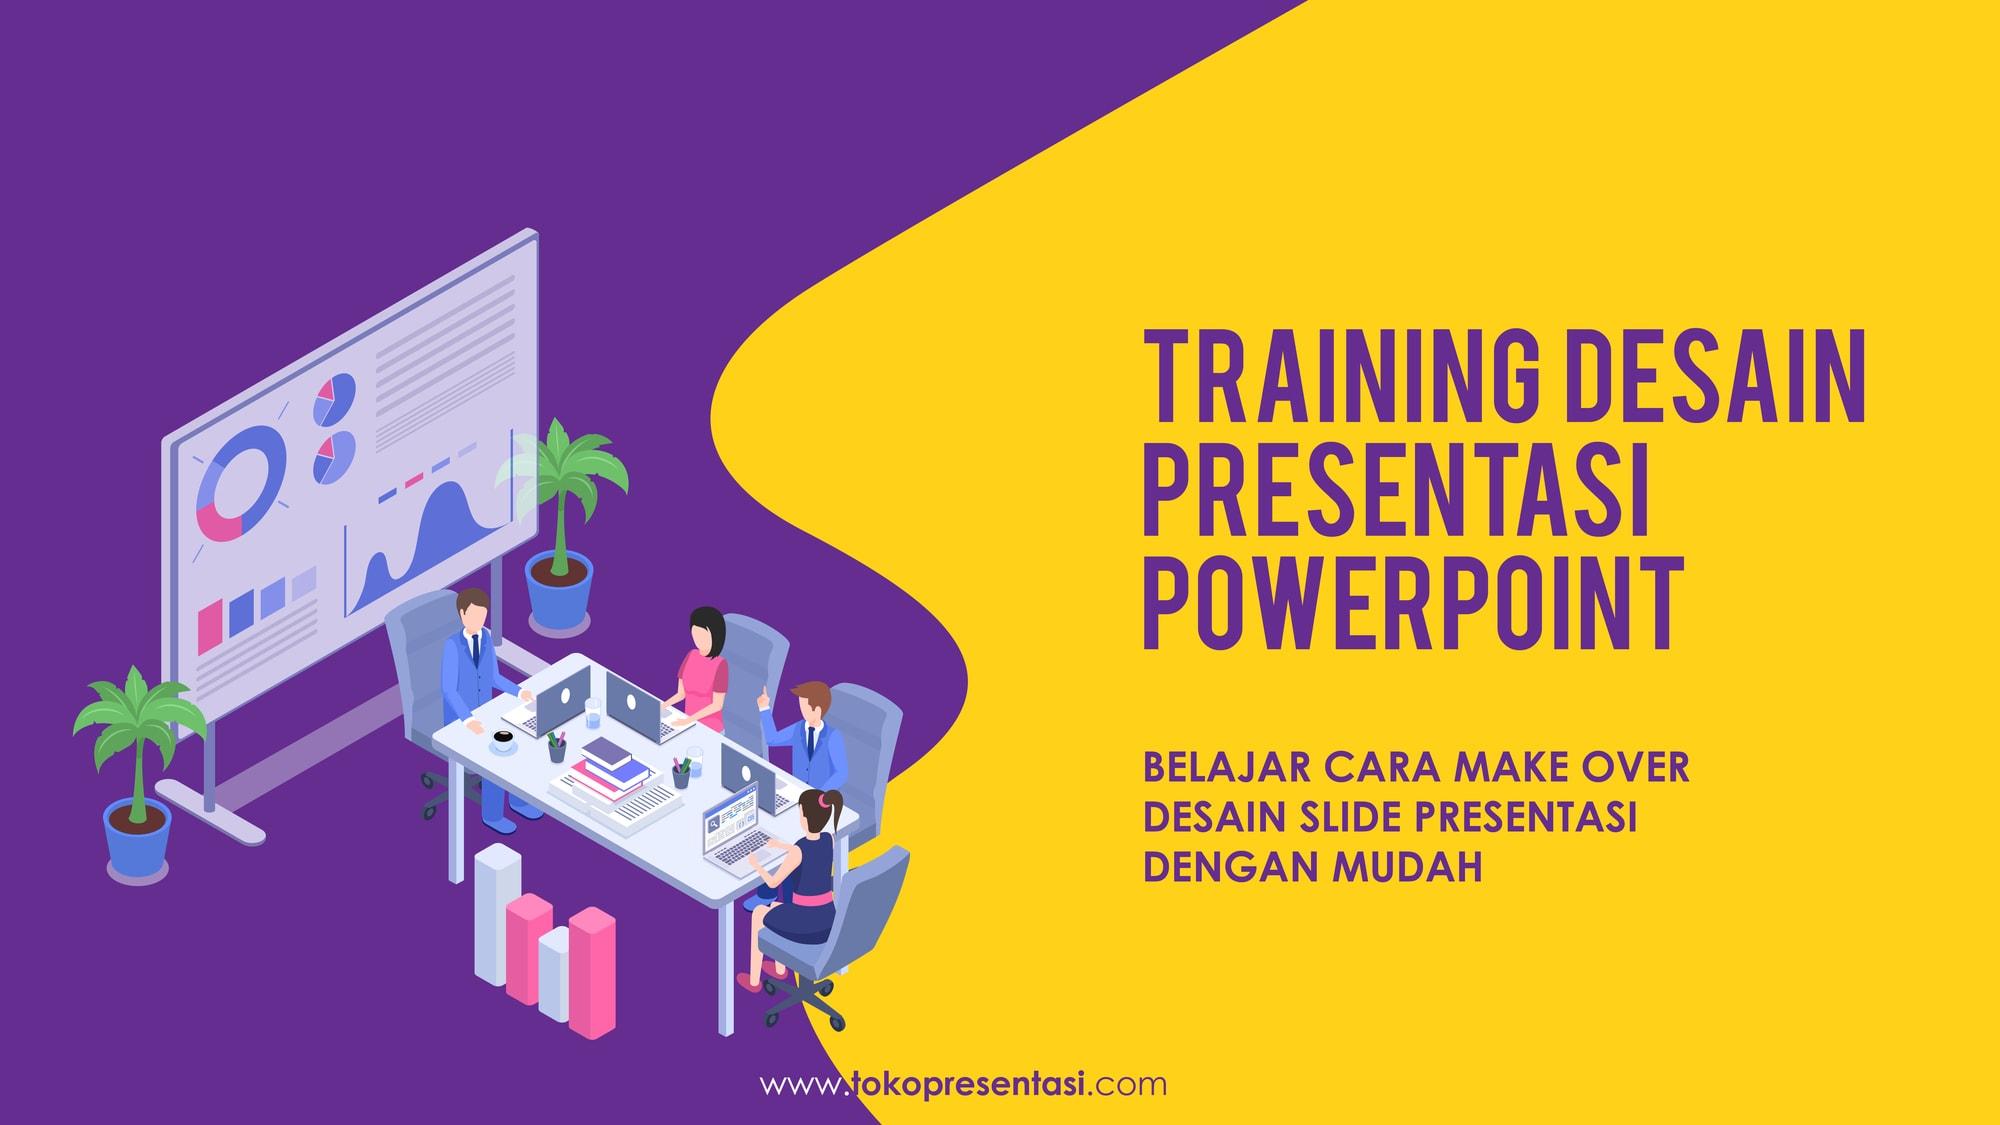 Workshop Presentasi Powerpoint Kementerian Tokopresentasi